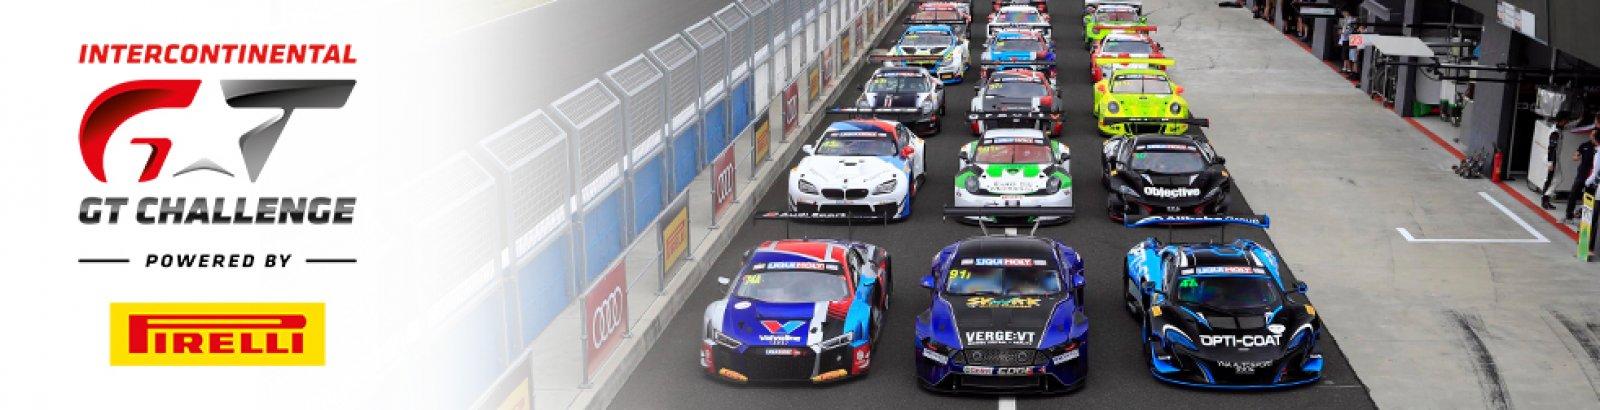 Intercontinental GT Challenge by Pirelli Image